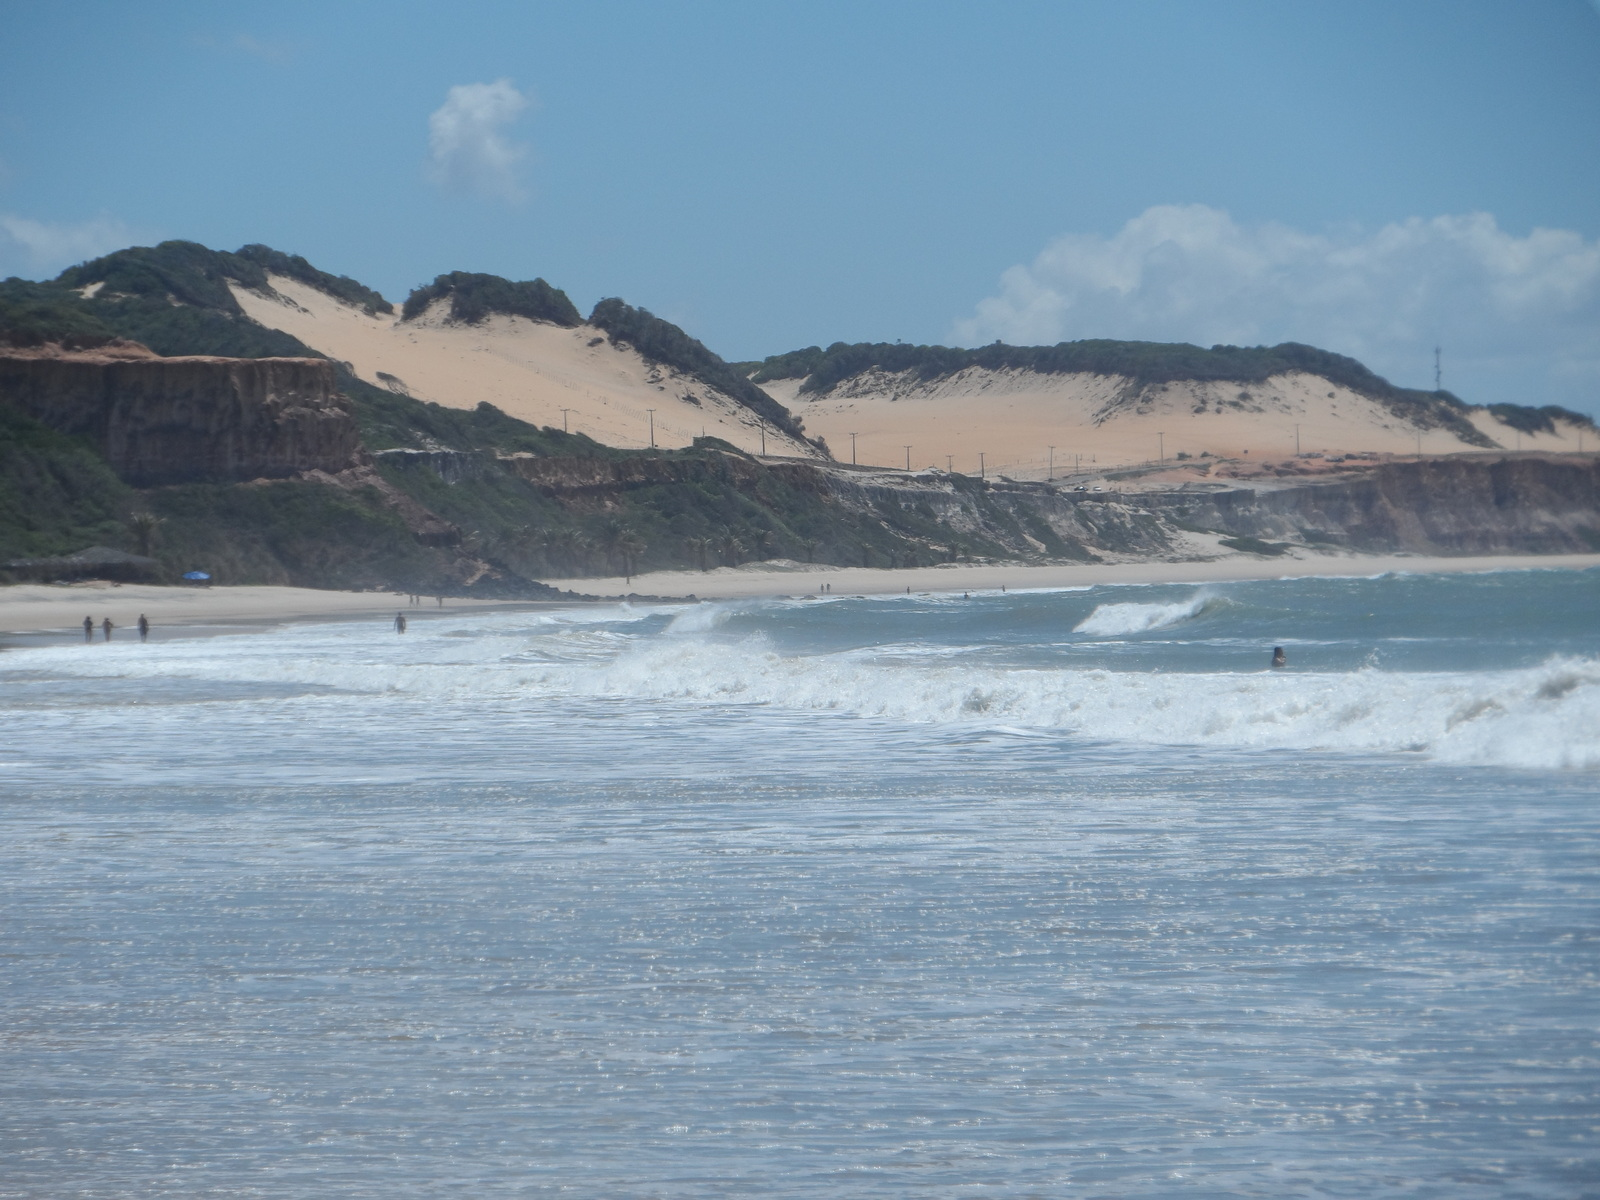 le spiagge infinite di Pipa in Nrasile vicino a Natal